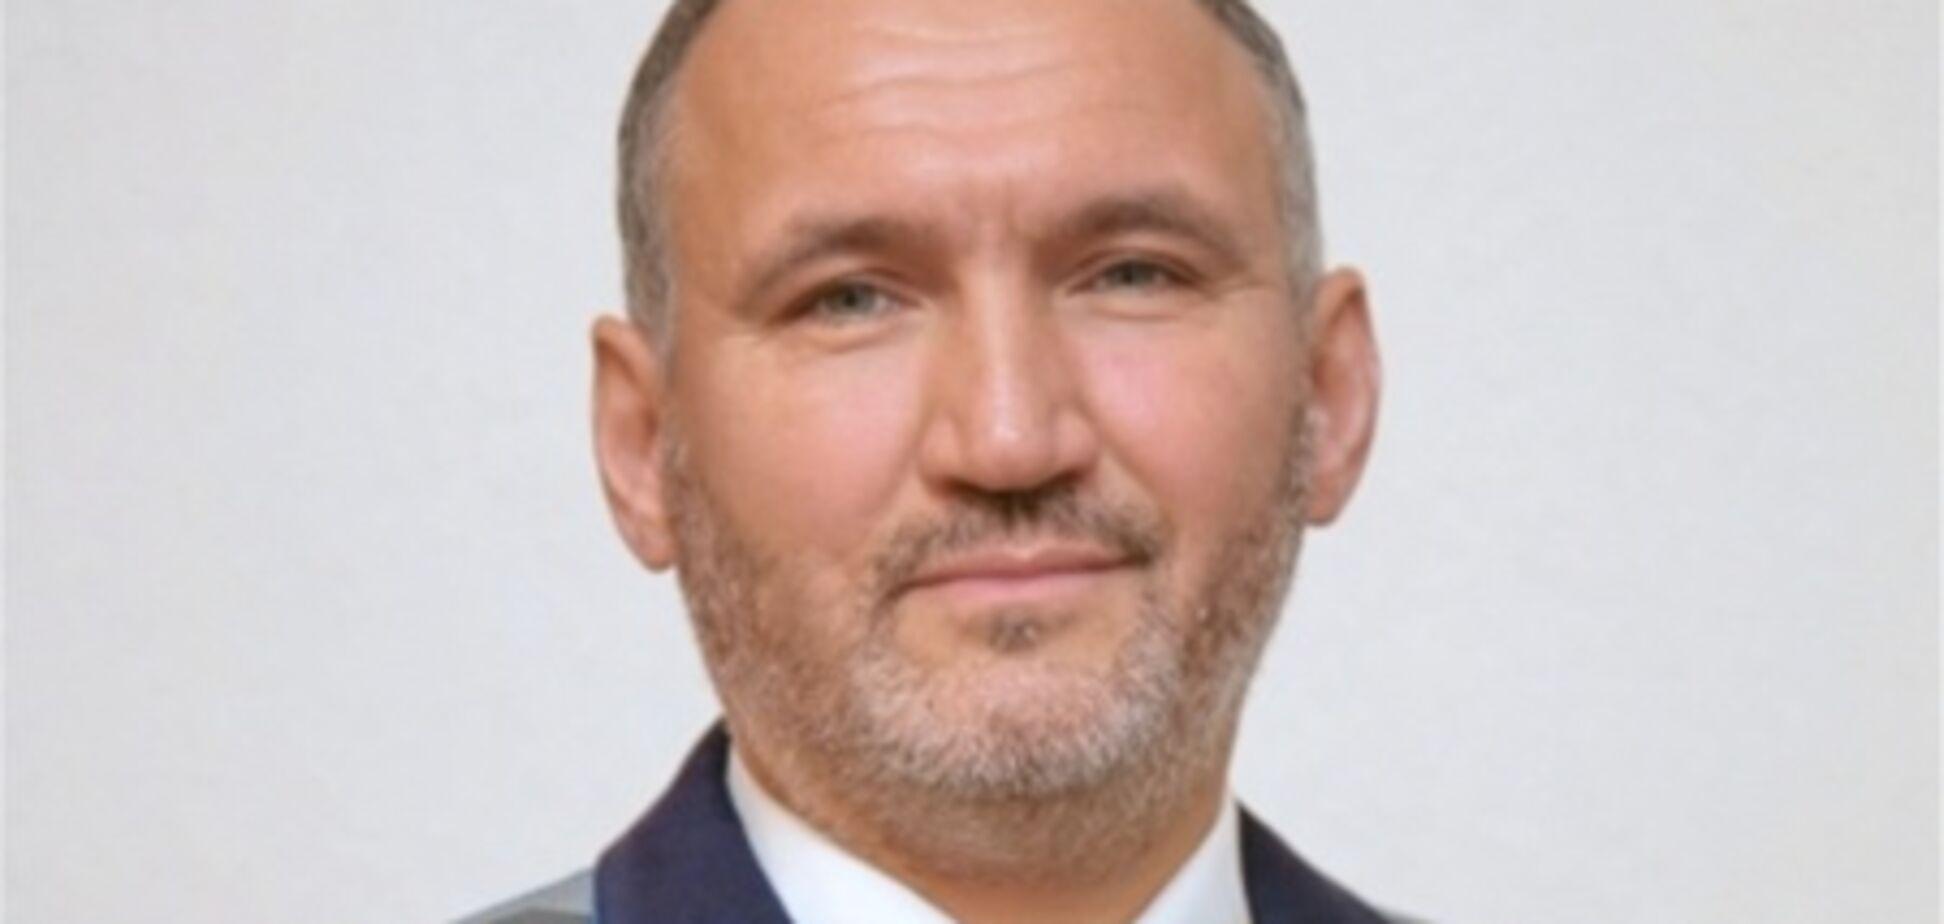 Kyiv Post просит у Генпрокуратуры прощения за ошибки